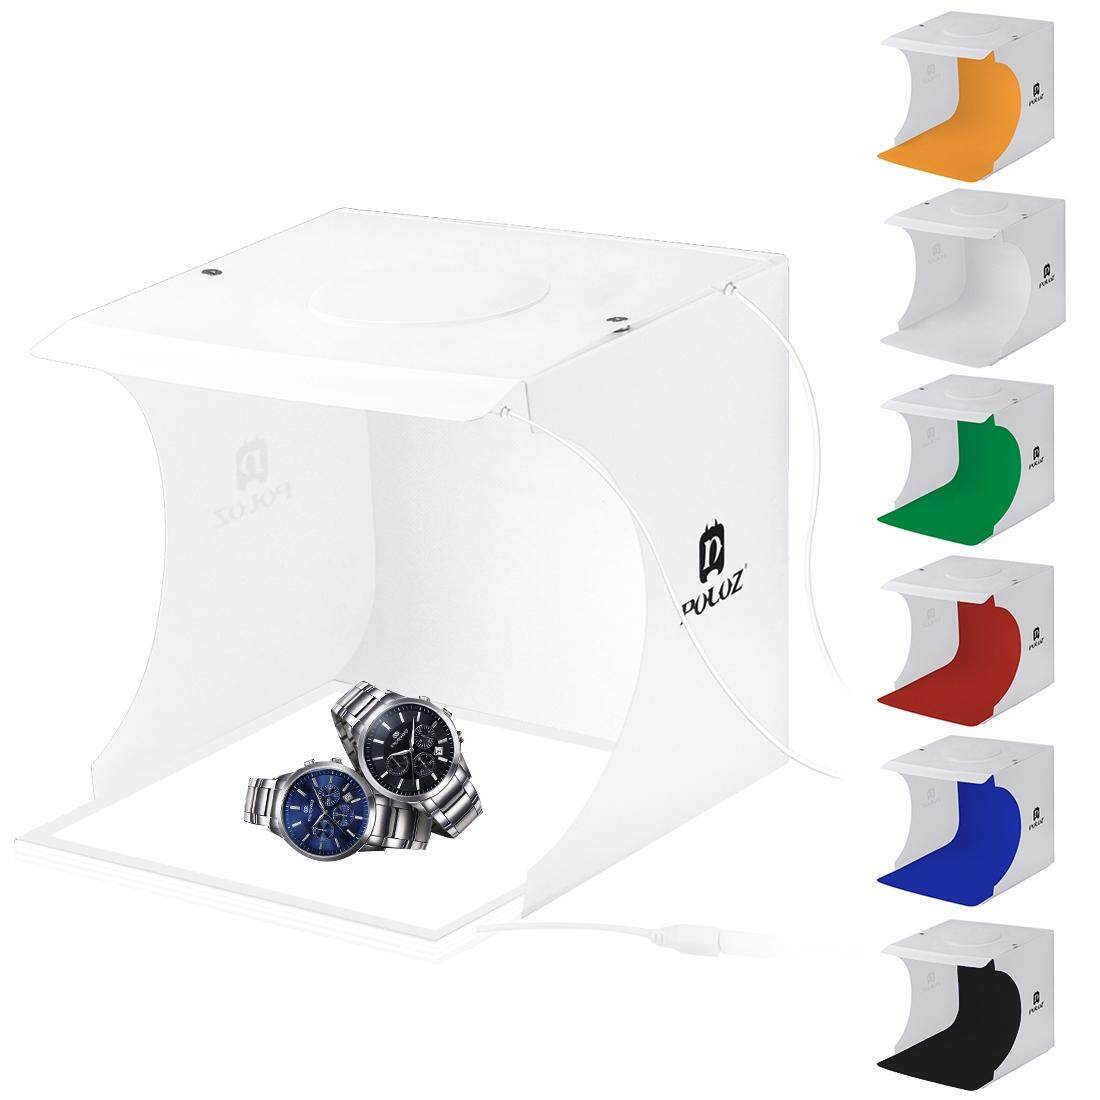 PULUZ Mini LED Photography Shadowless Light Lamp Panel Pad + Studio Shooting Tent Box, Acrylic Material, 20cm x 20cm Effective Area